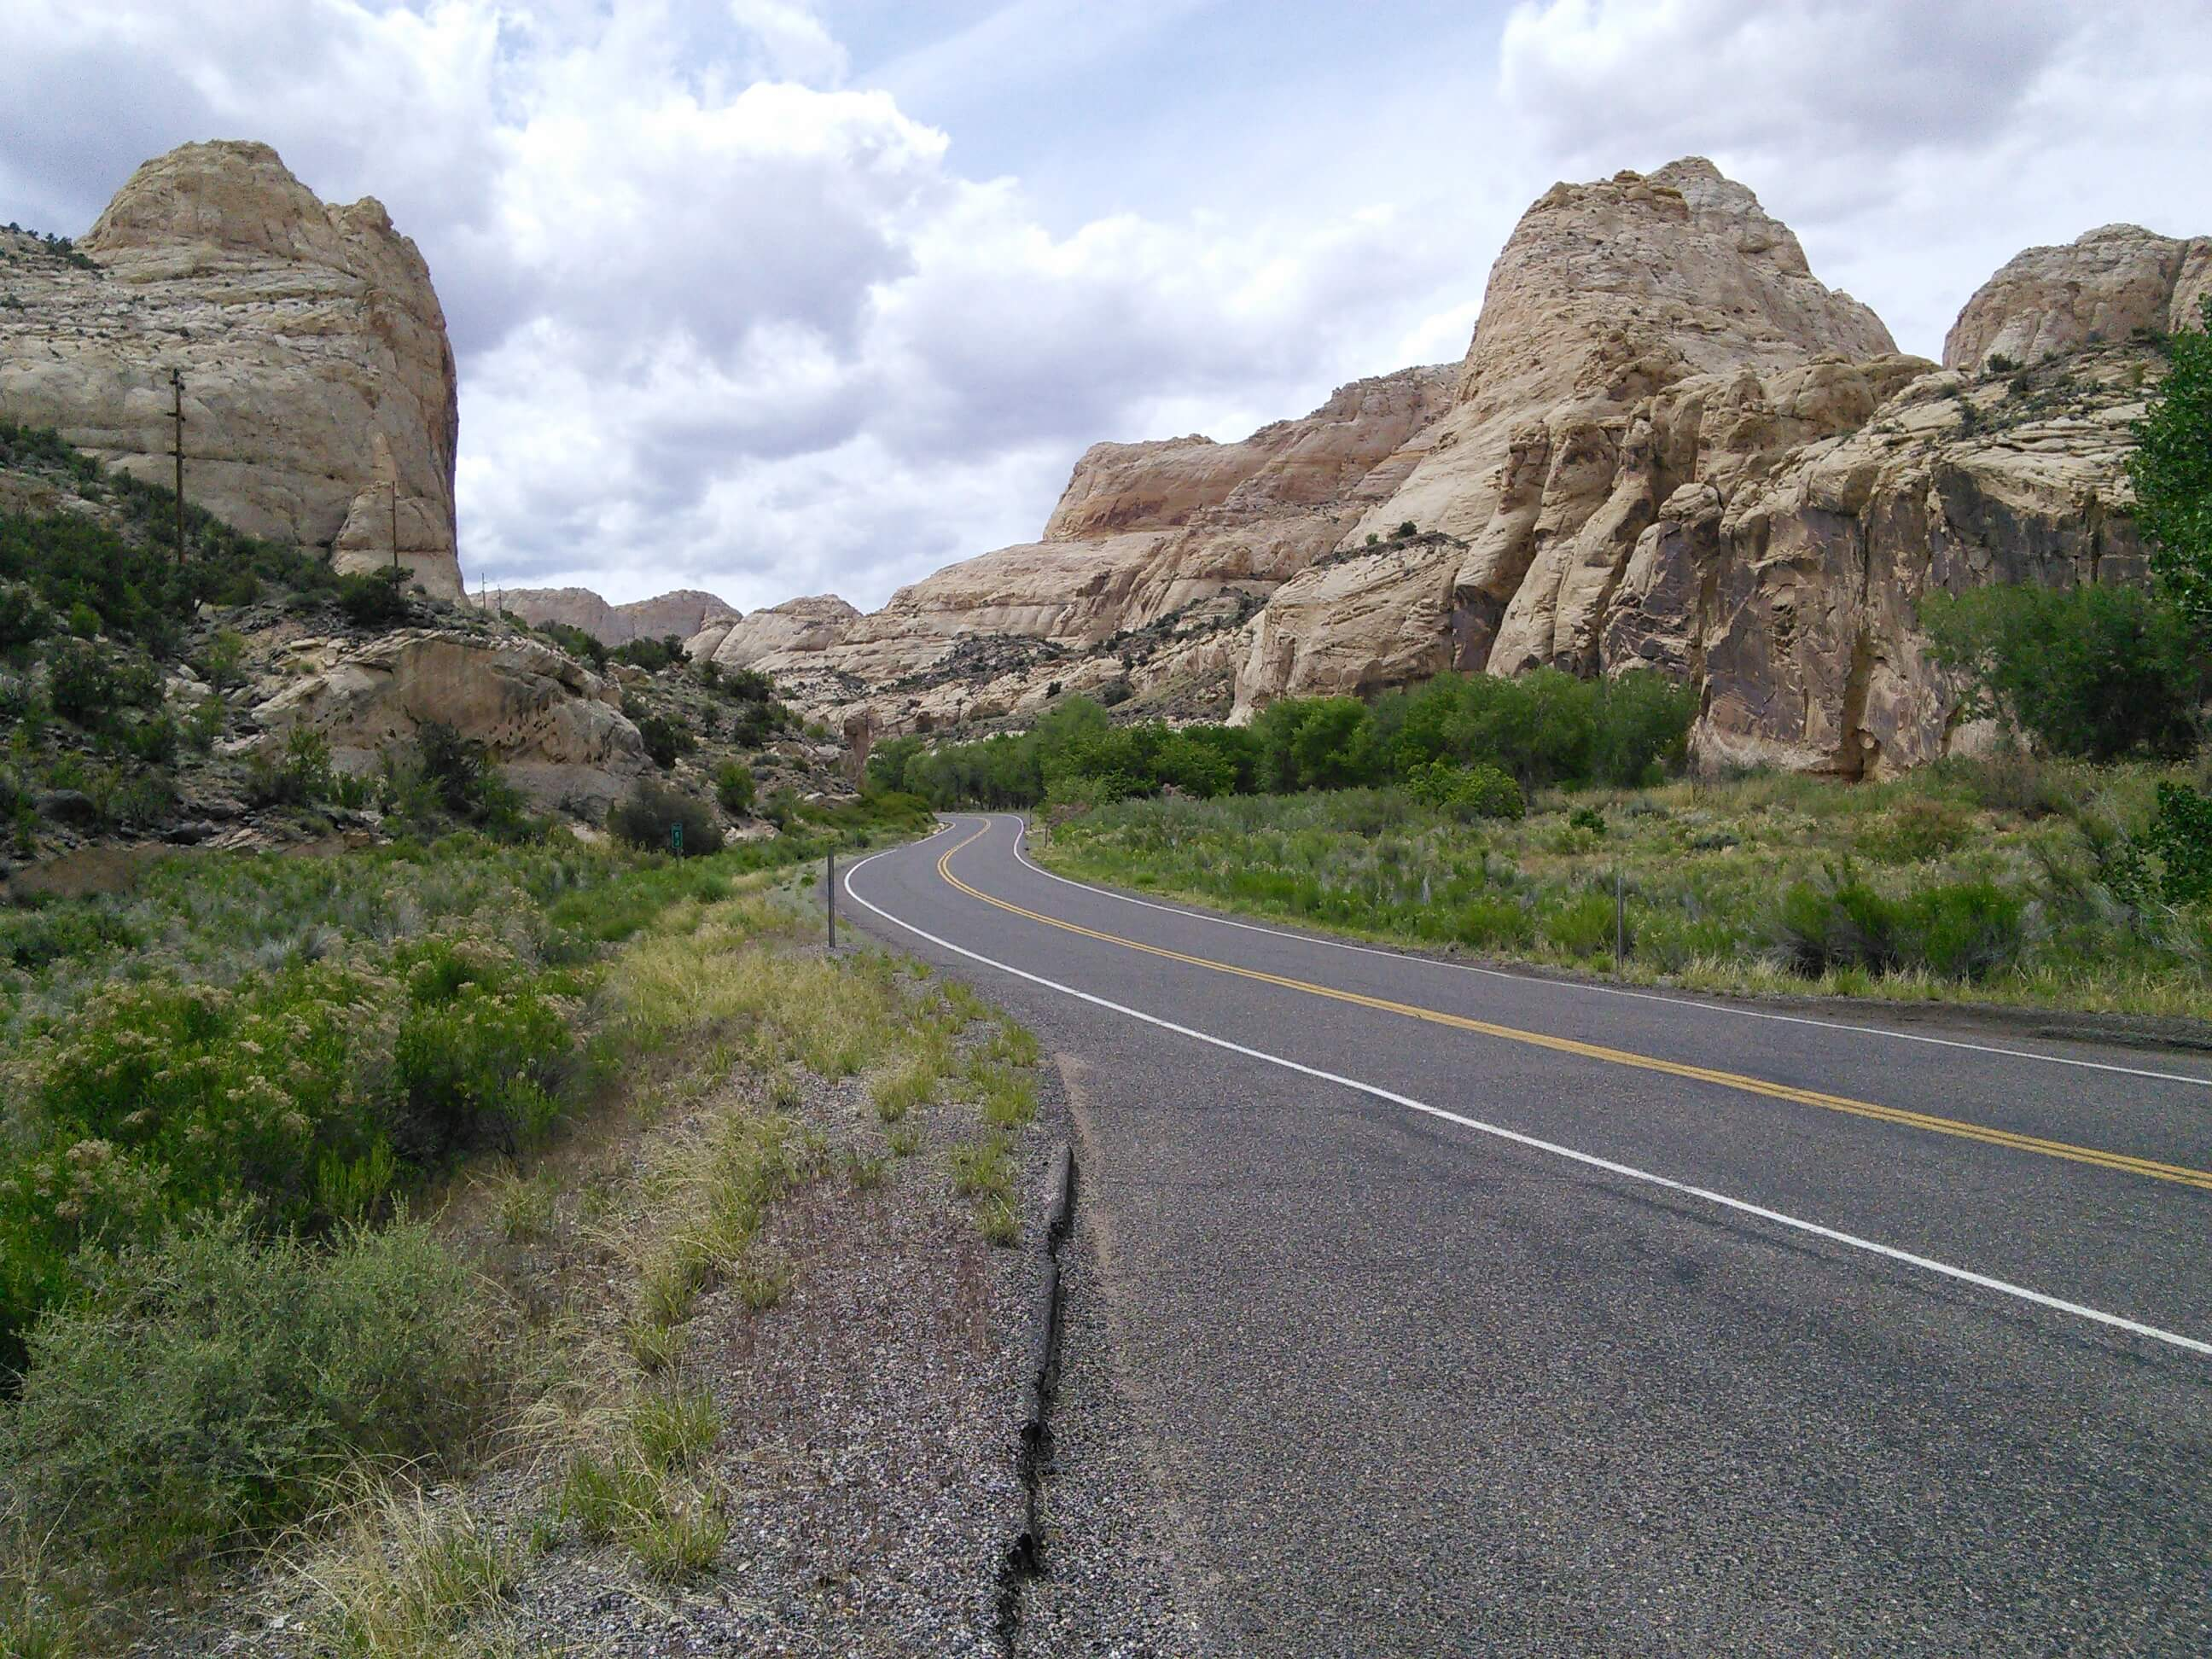 HWY 24 on the way to Goblin Valley SP, Utah